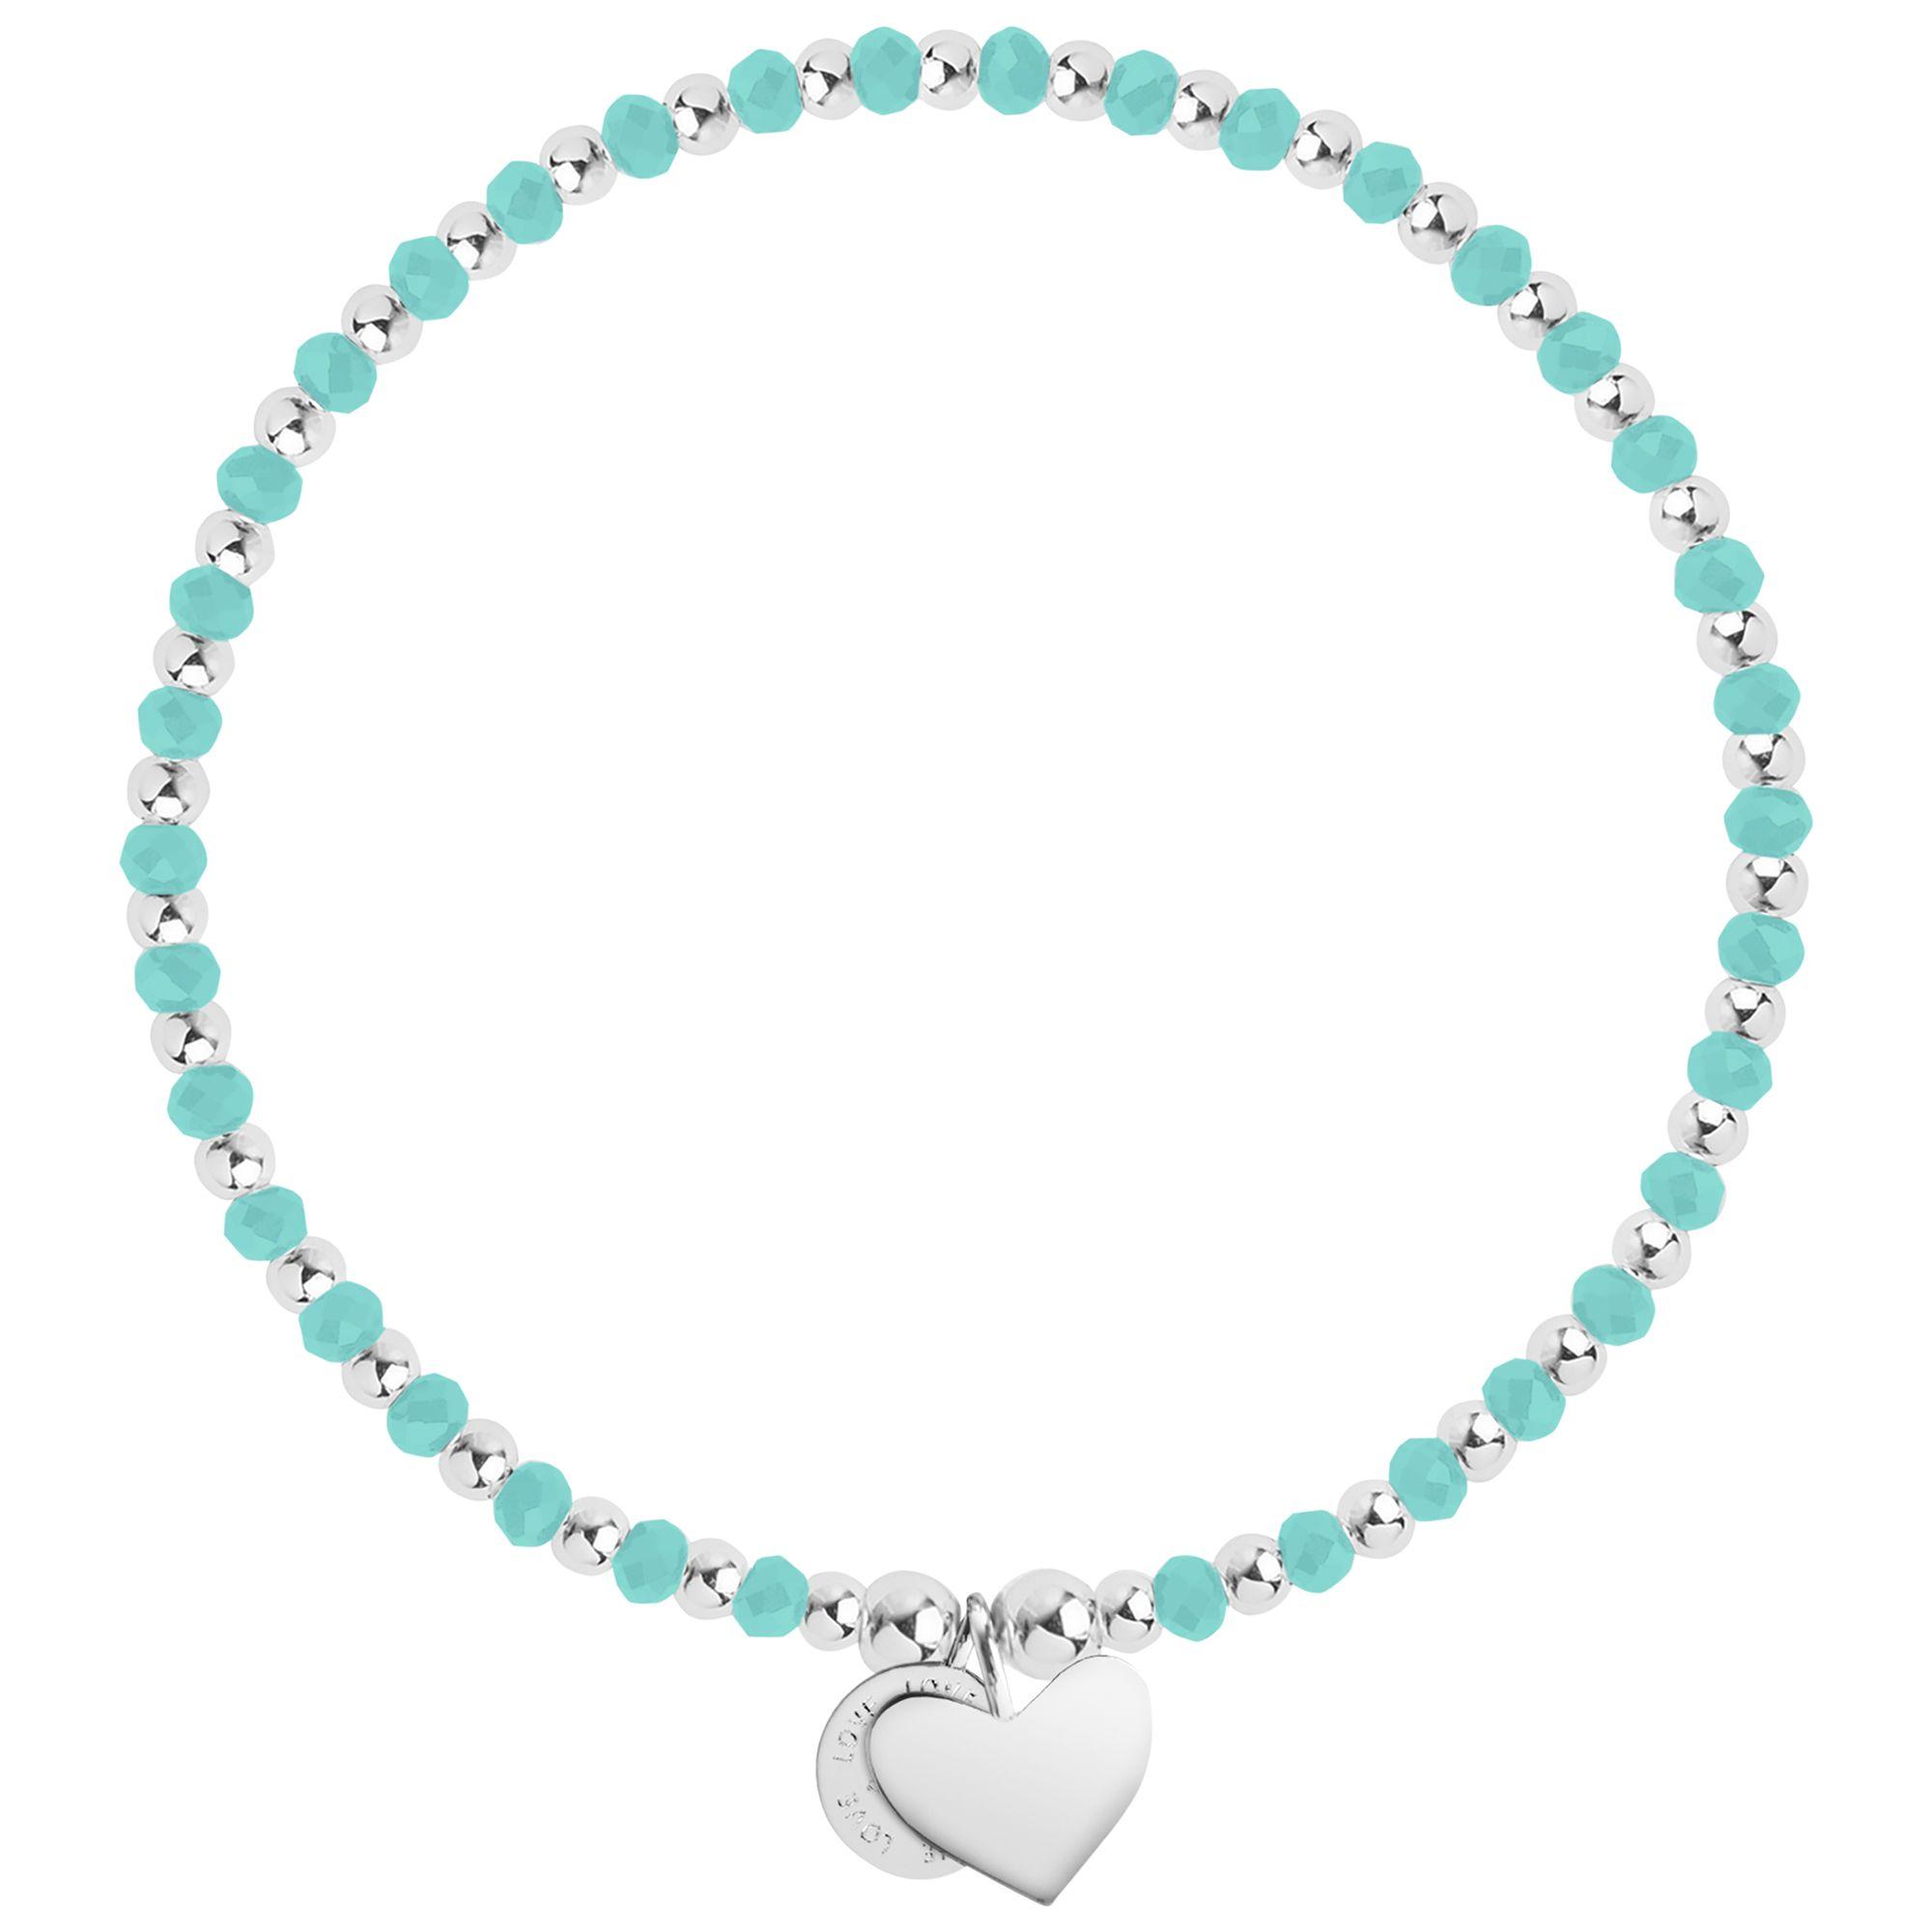 Joma Joma Wisdom Heart Charm Bracelet, Turquoise/Silver